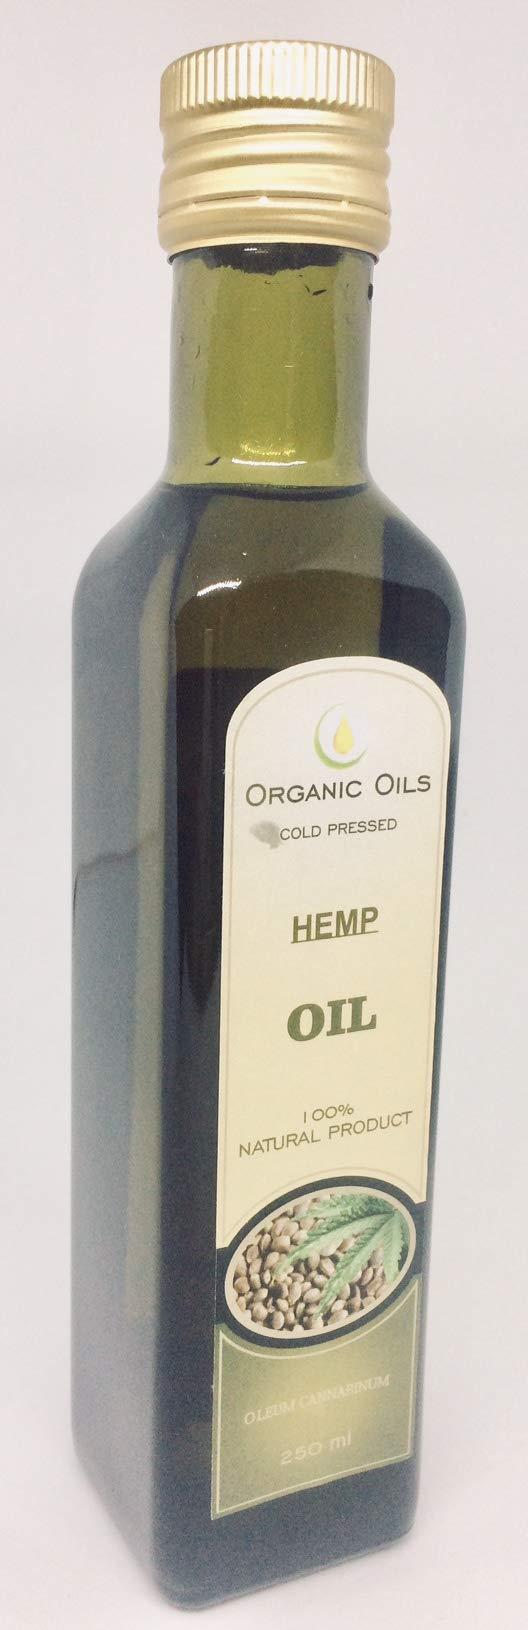 Extra Virgin Hemp Seed Oil 9 fl oz/250 ml Organic Cold Pressed Unrefined Raw No GMO